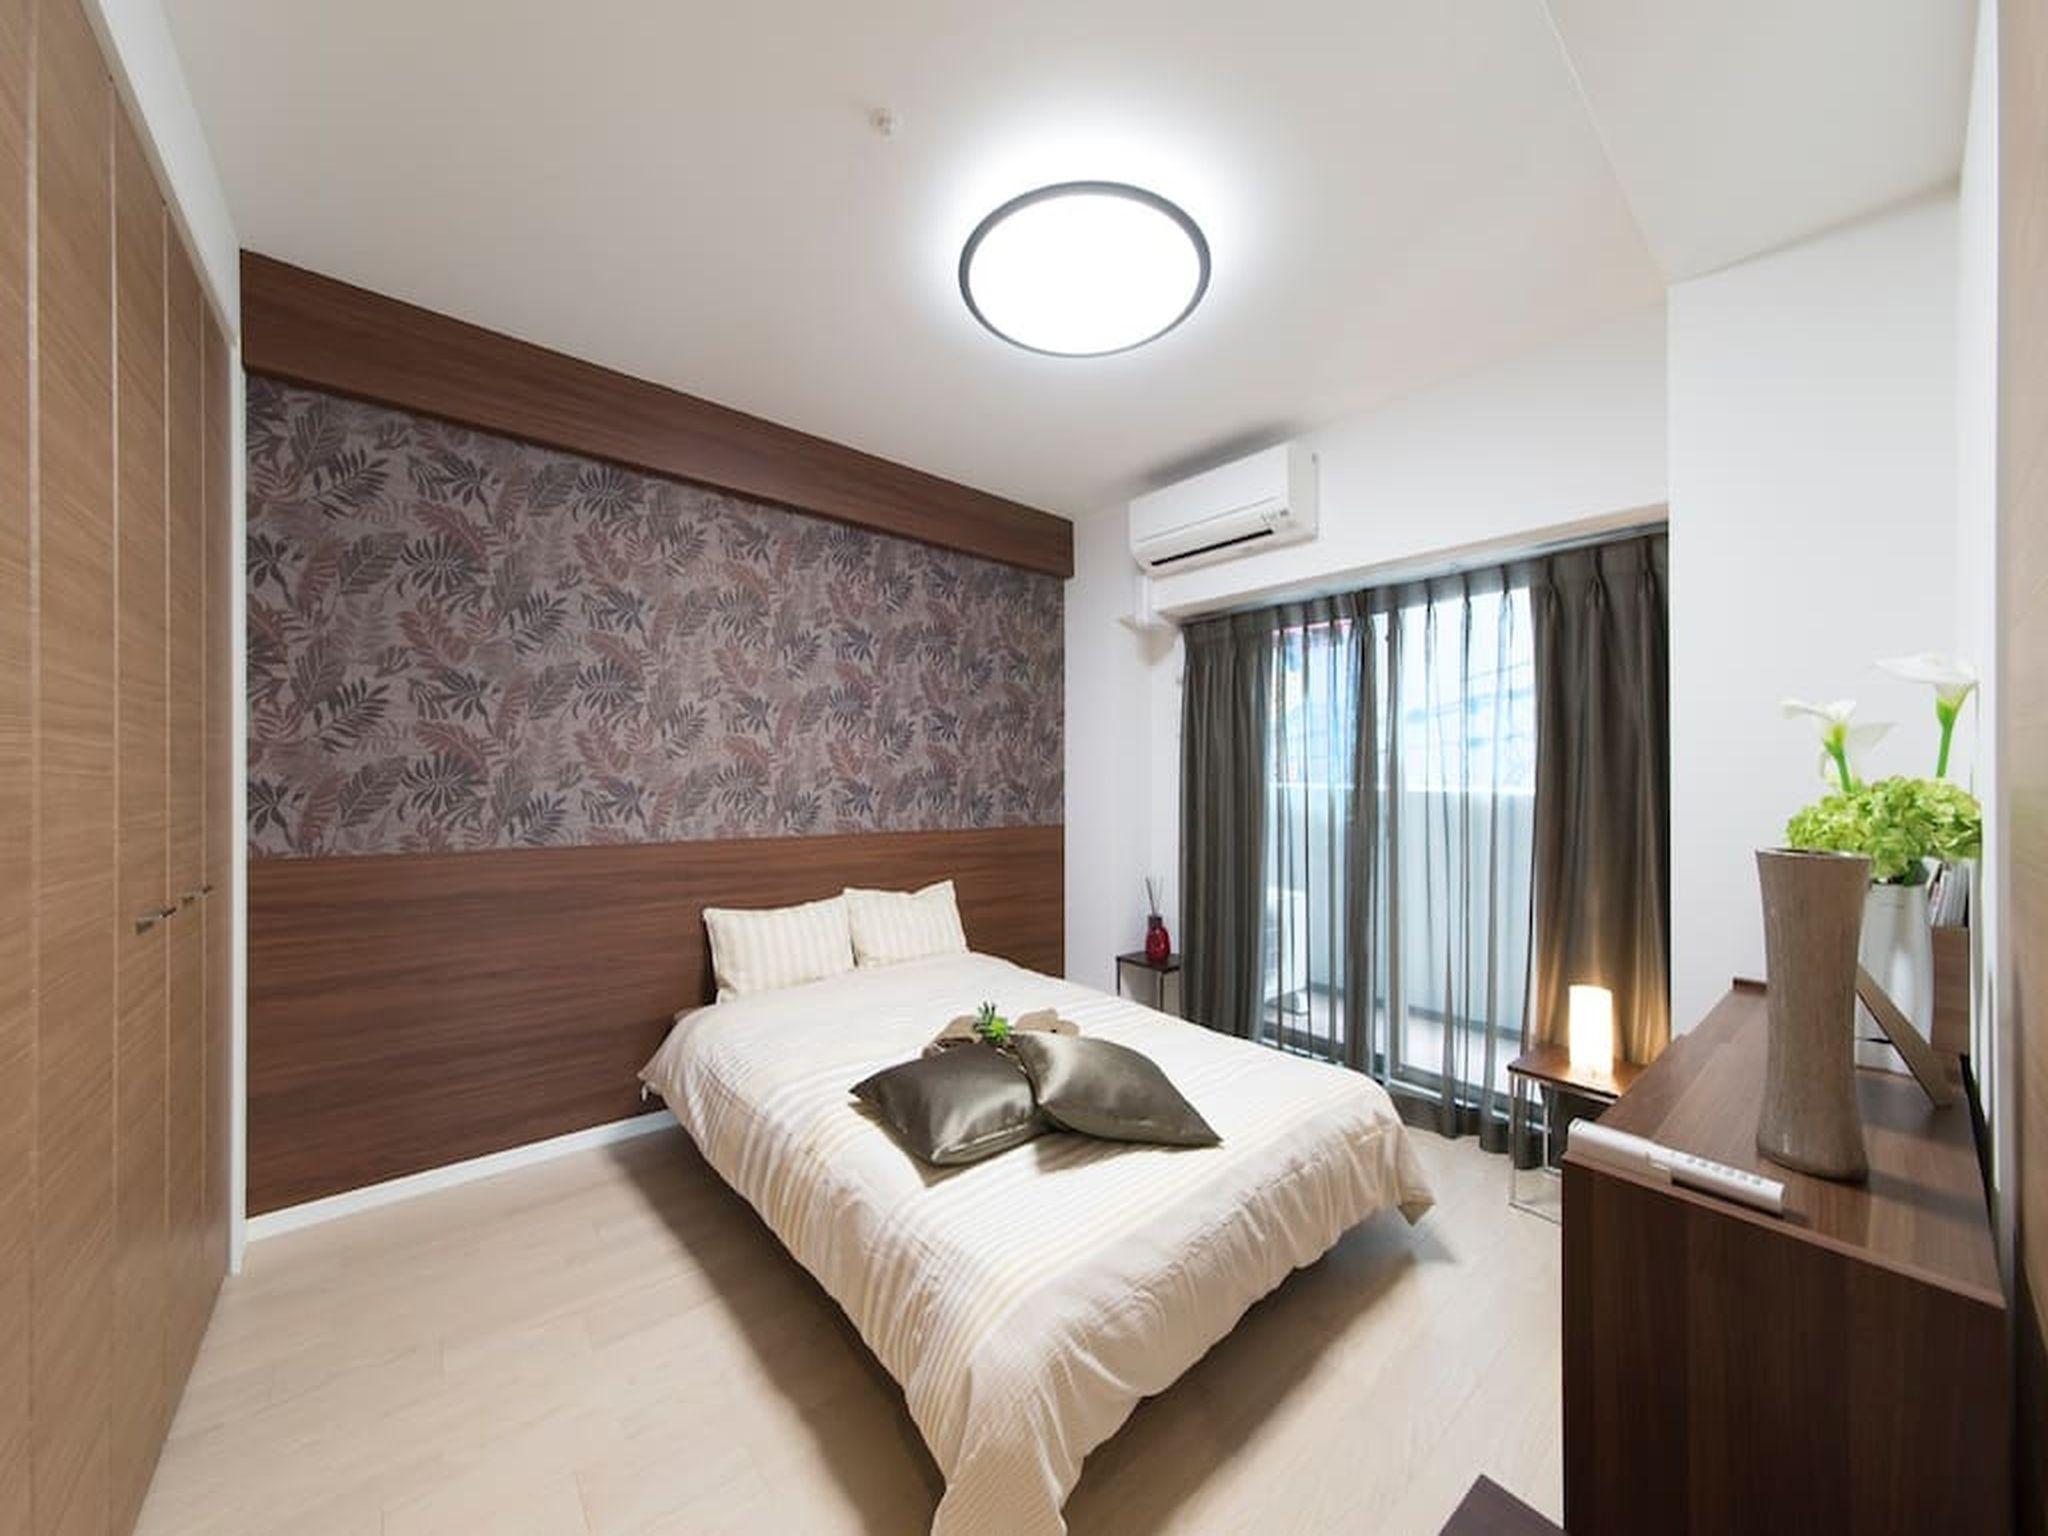 vt四卧室公寓-日本桥no34 (vt 4 bedroom apartment in nipponbashi